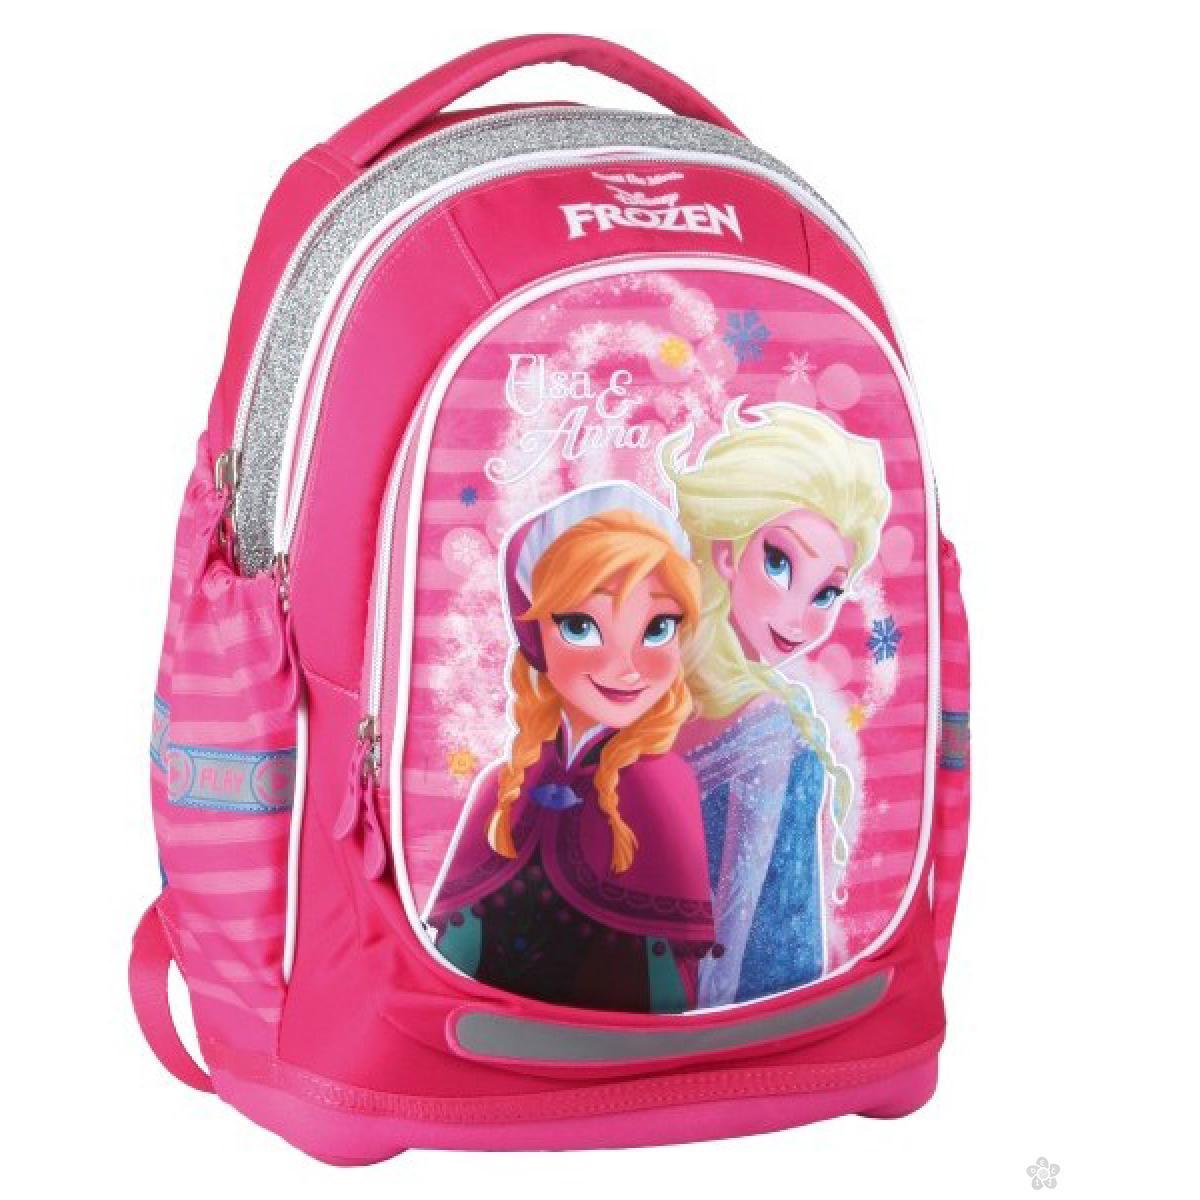 Anatomski ranac Frozen Pink Kingdom 322616